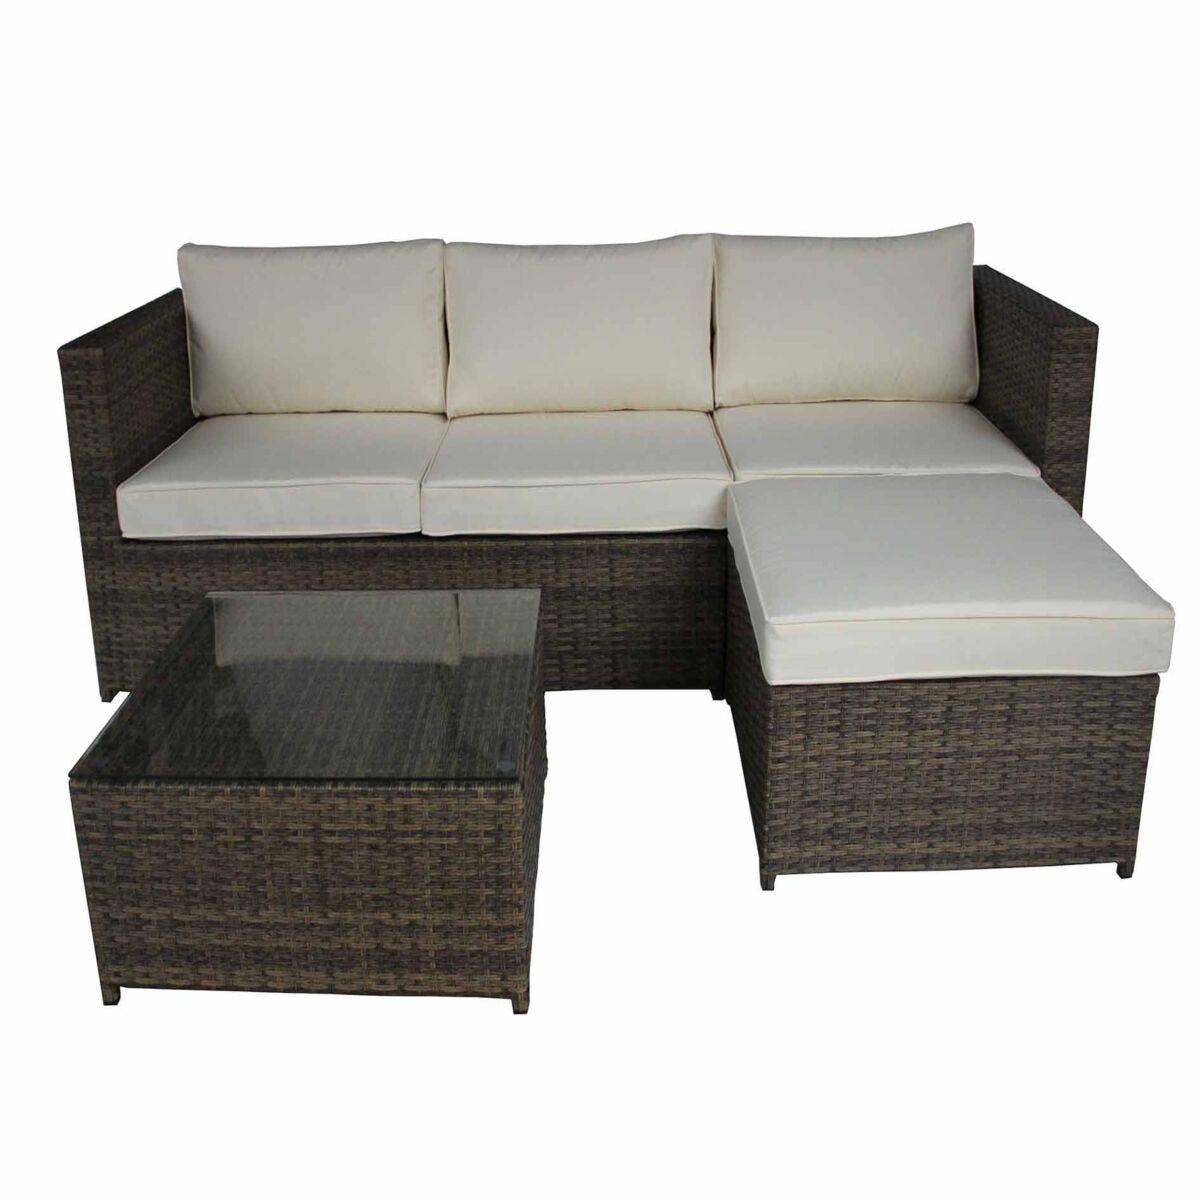 Charles Bentley L-Shaped 3 Seater Rattan Garden Lounge Set